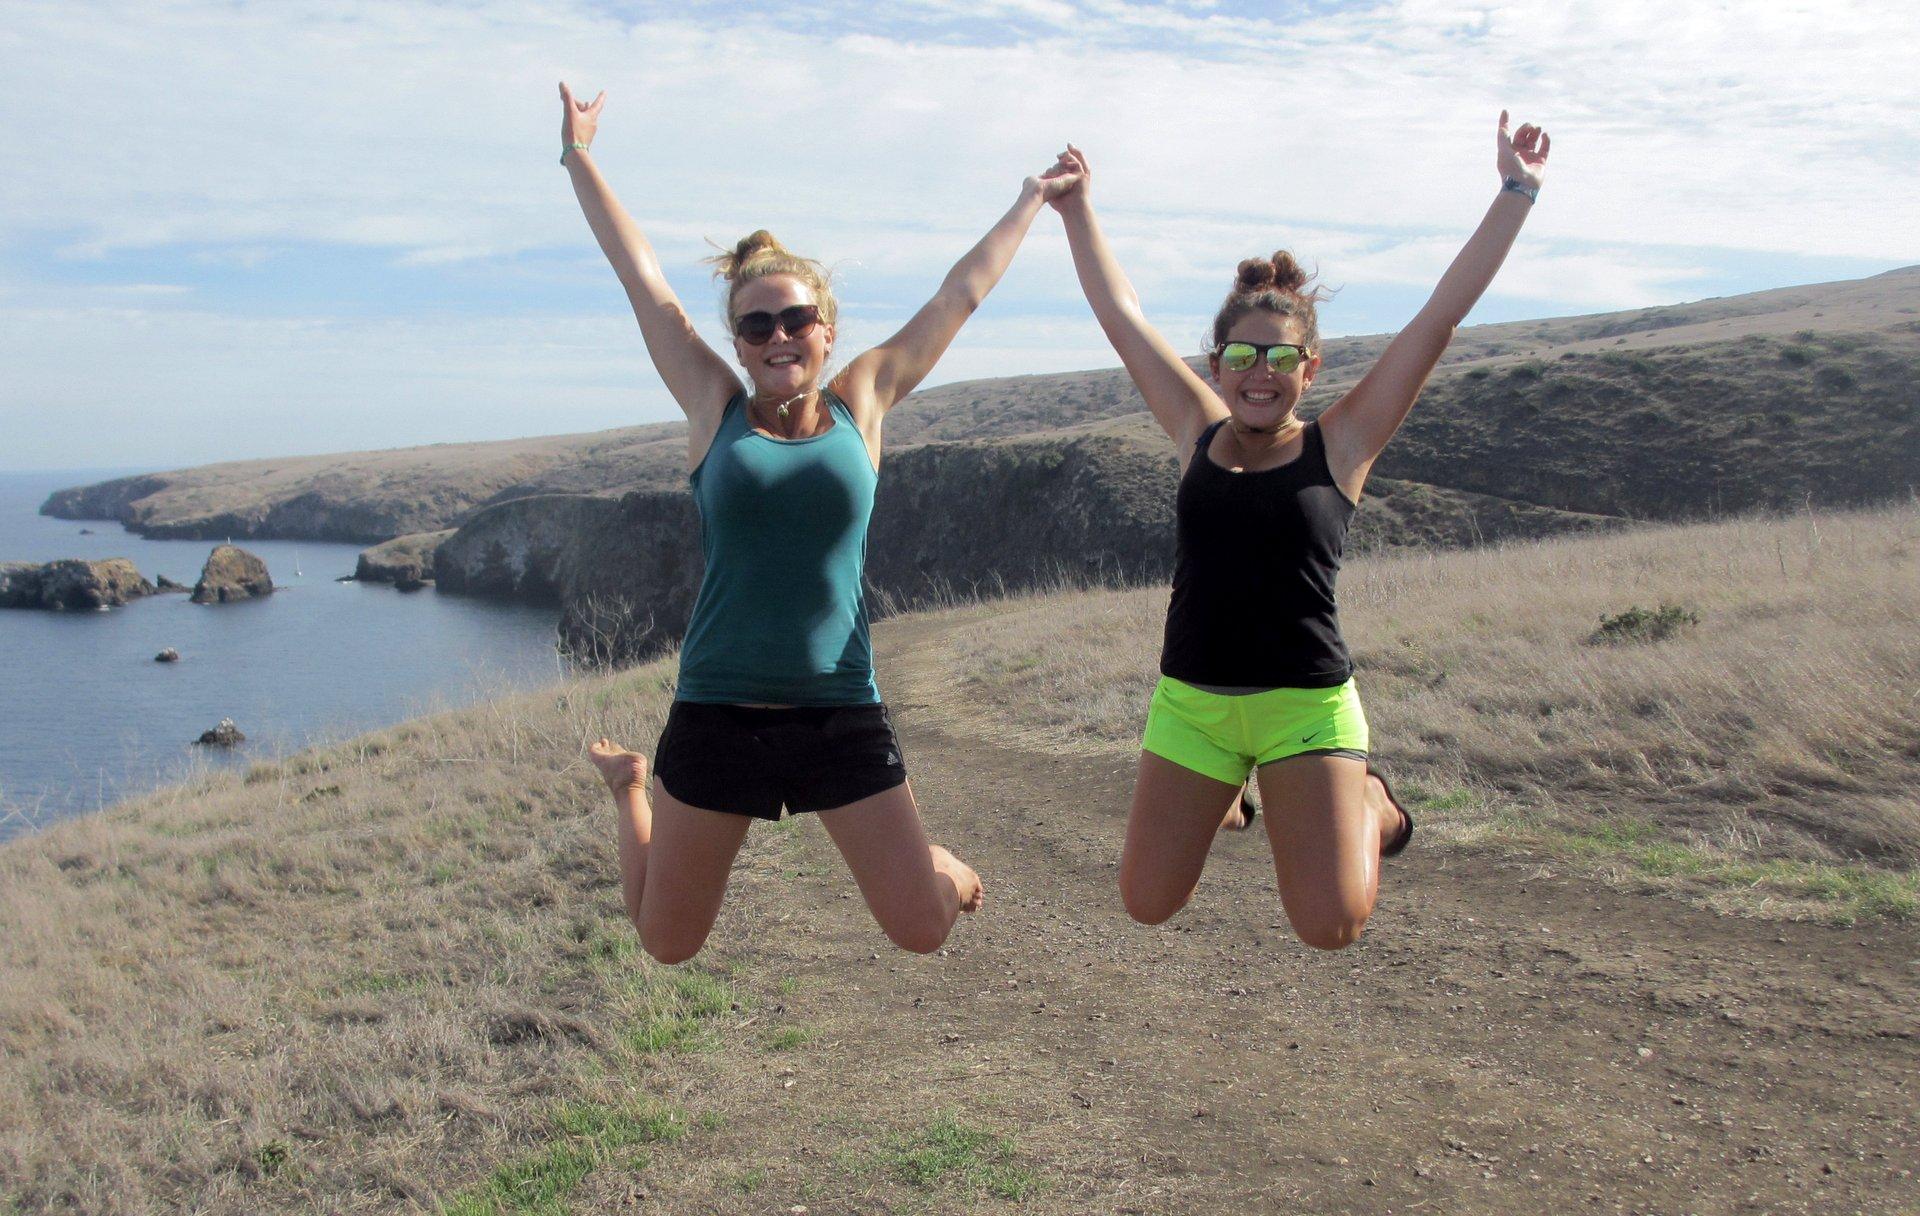 Stefanie Kuisle & Zeinab Greif hiking on Santa Cruz Island